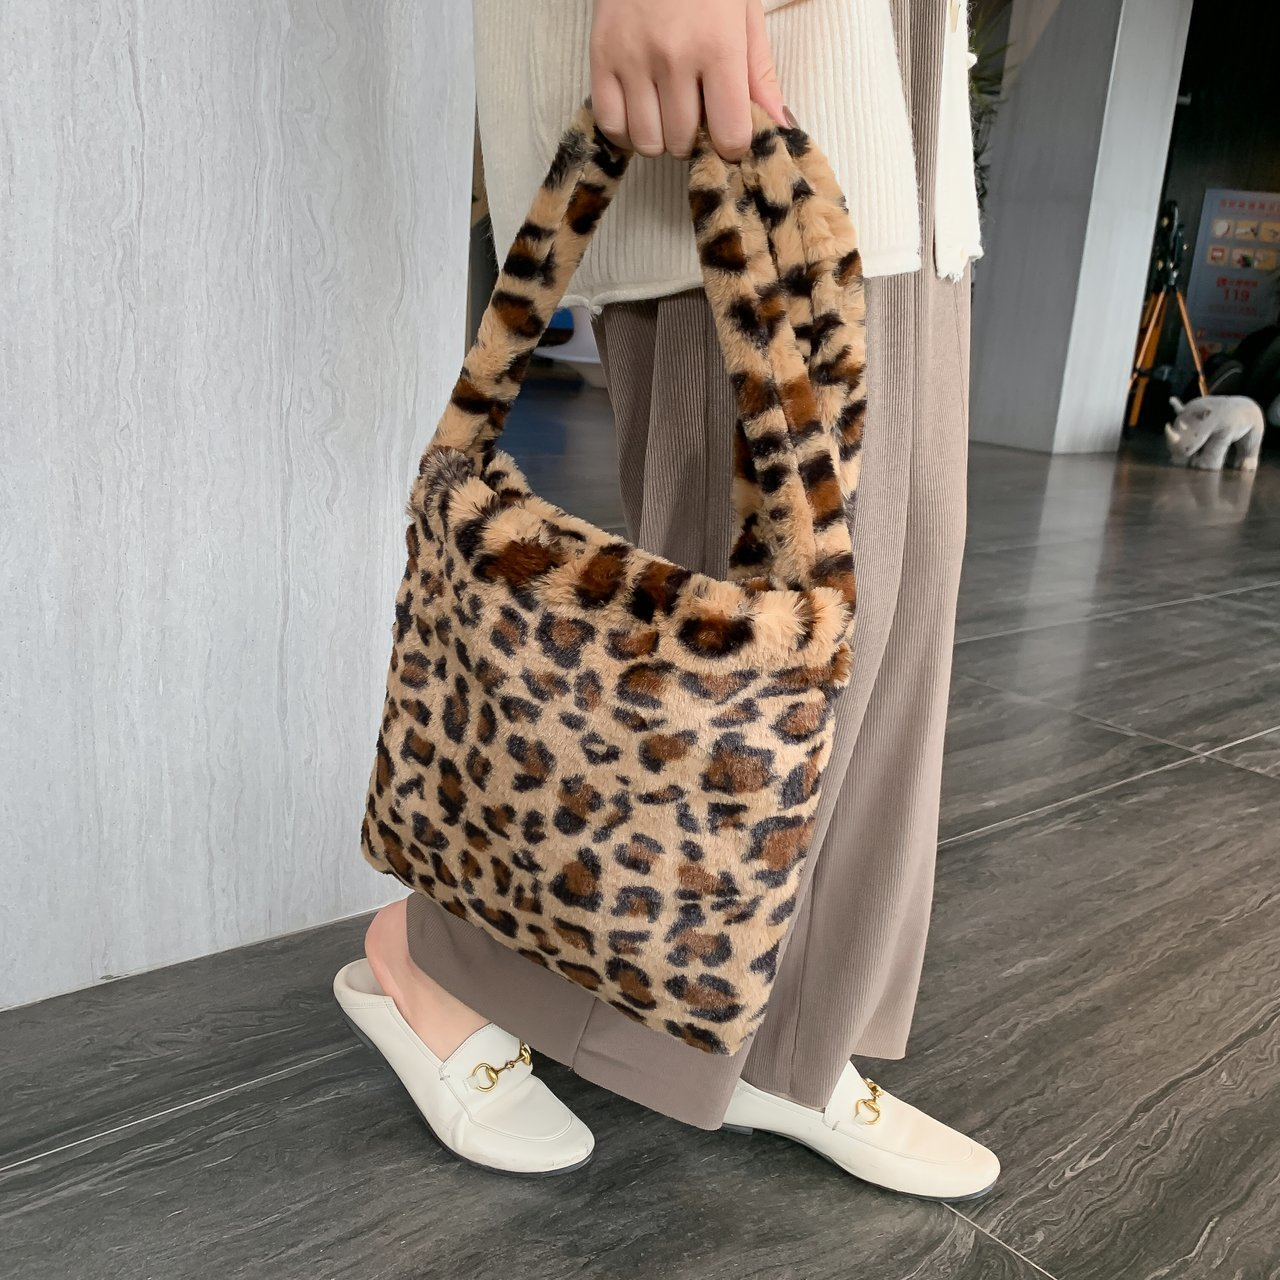 Leopard Plush Shoulder Bags For Women New Autumn Winter Large Capacity Messenger Bag HOT Sell  Ladies Vintage Handbags Women